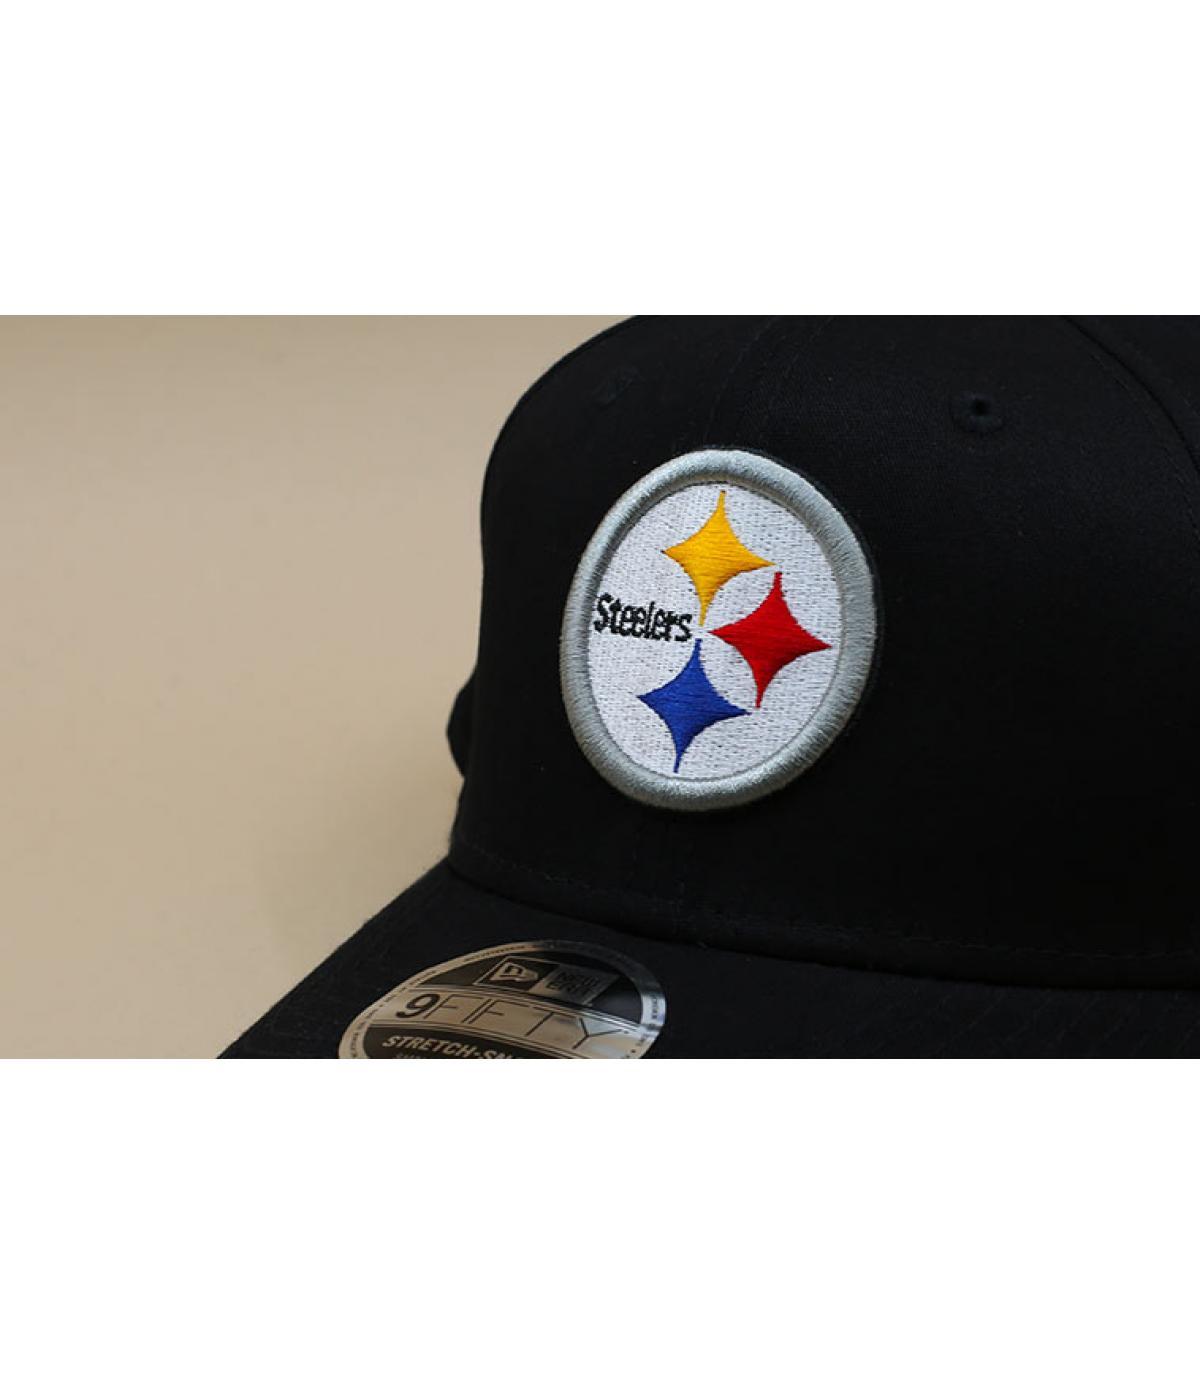 Détails Snapback Team Stretch Steelers 950 - image 3